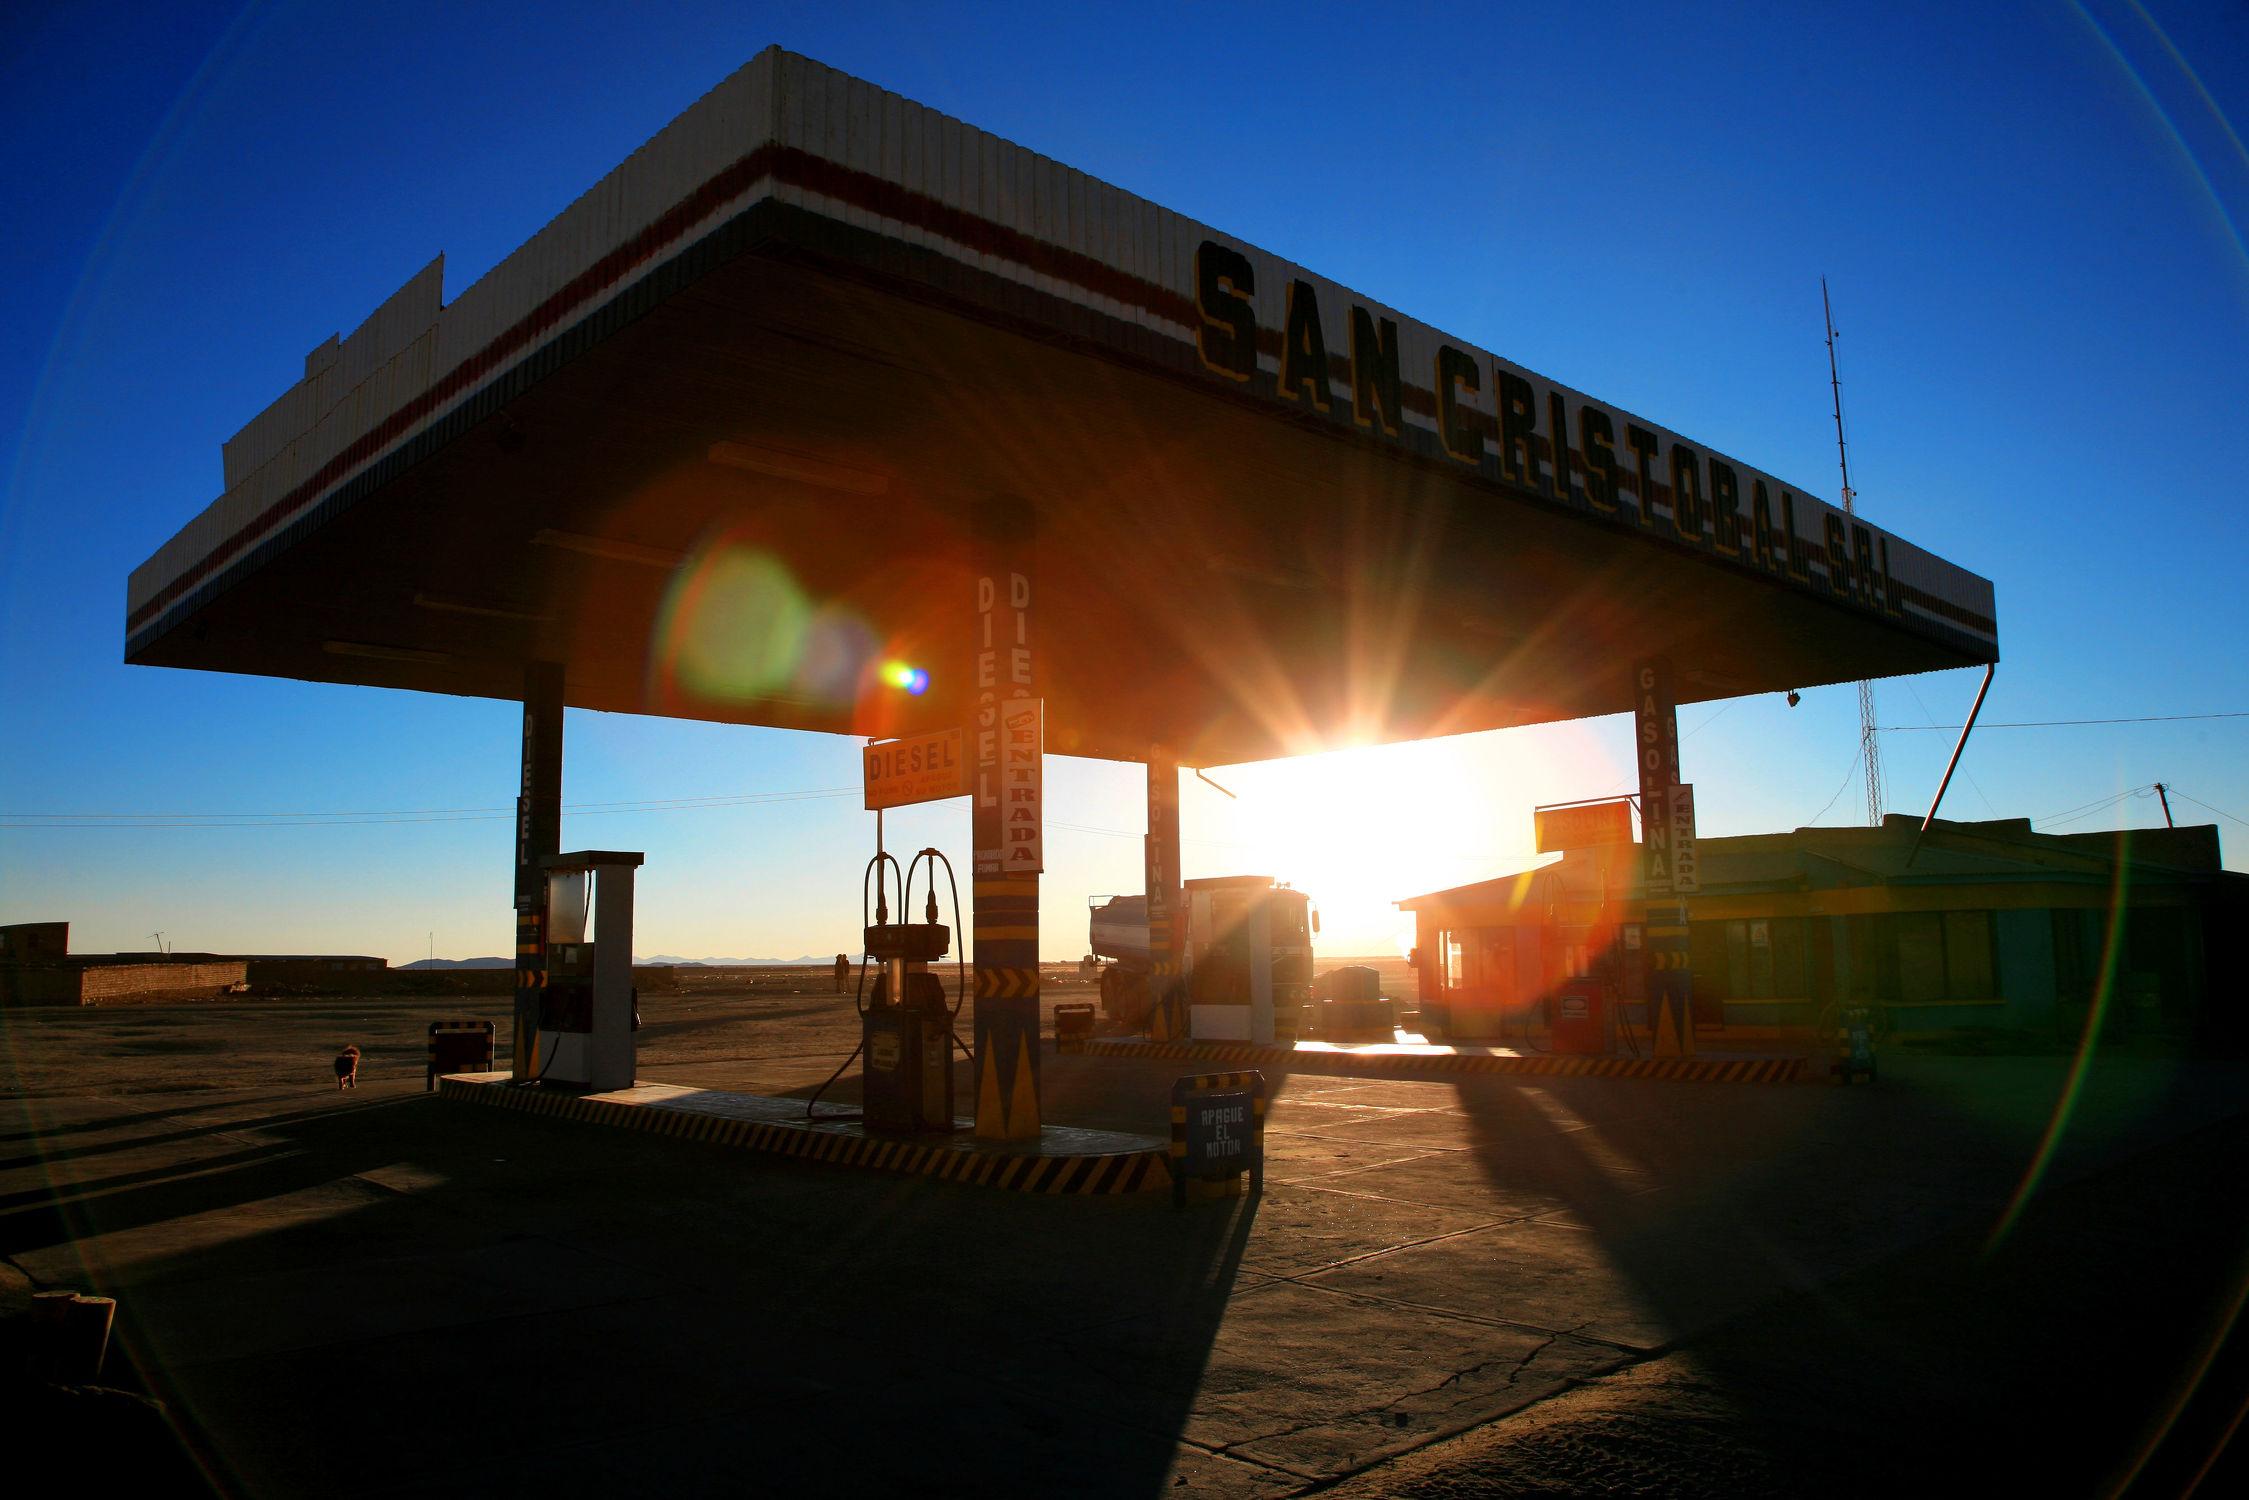 Bild mit Fahrzeuge, Autos, USA, Auto, car, cars, Petrol Station, Tankstelle, tankstellen, fahrzeug, Tank, Tanken